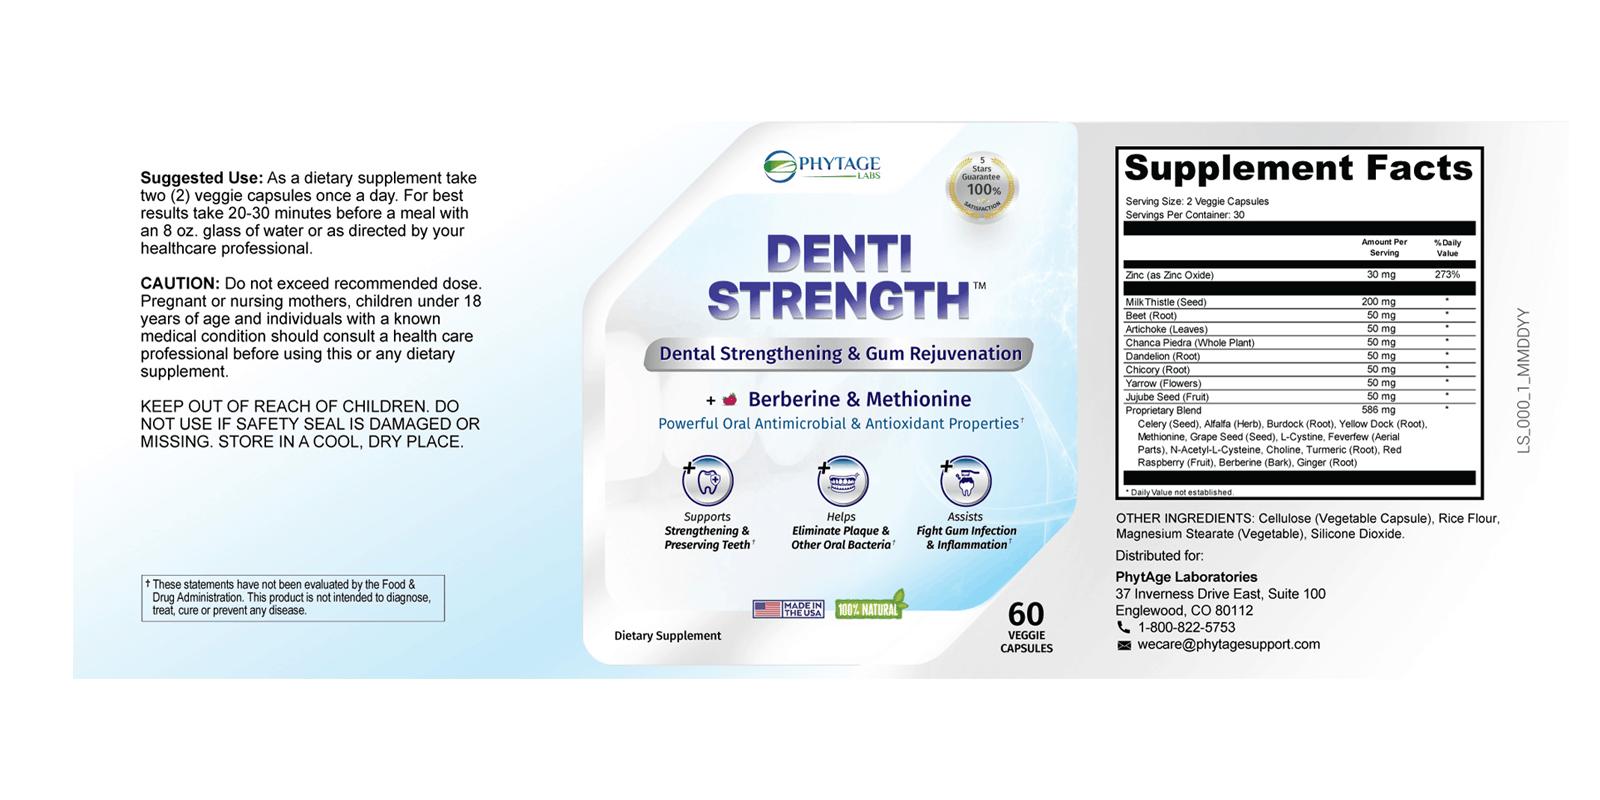 Denti Strength Dosage